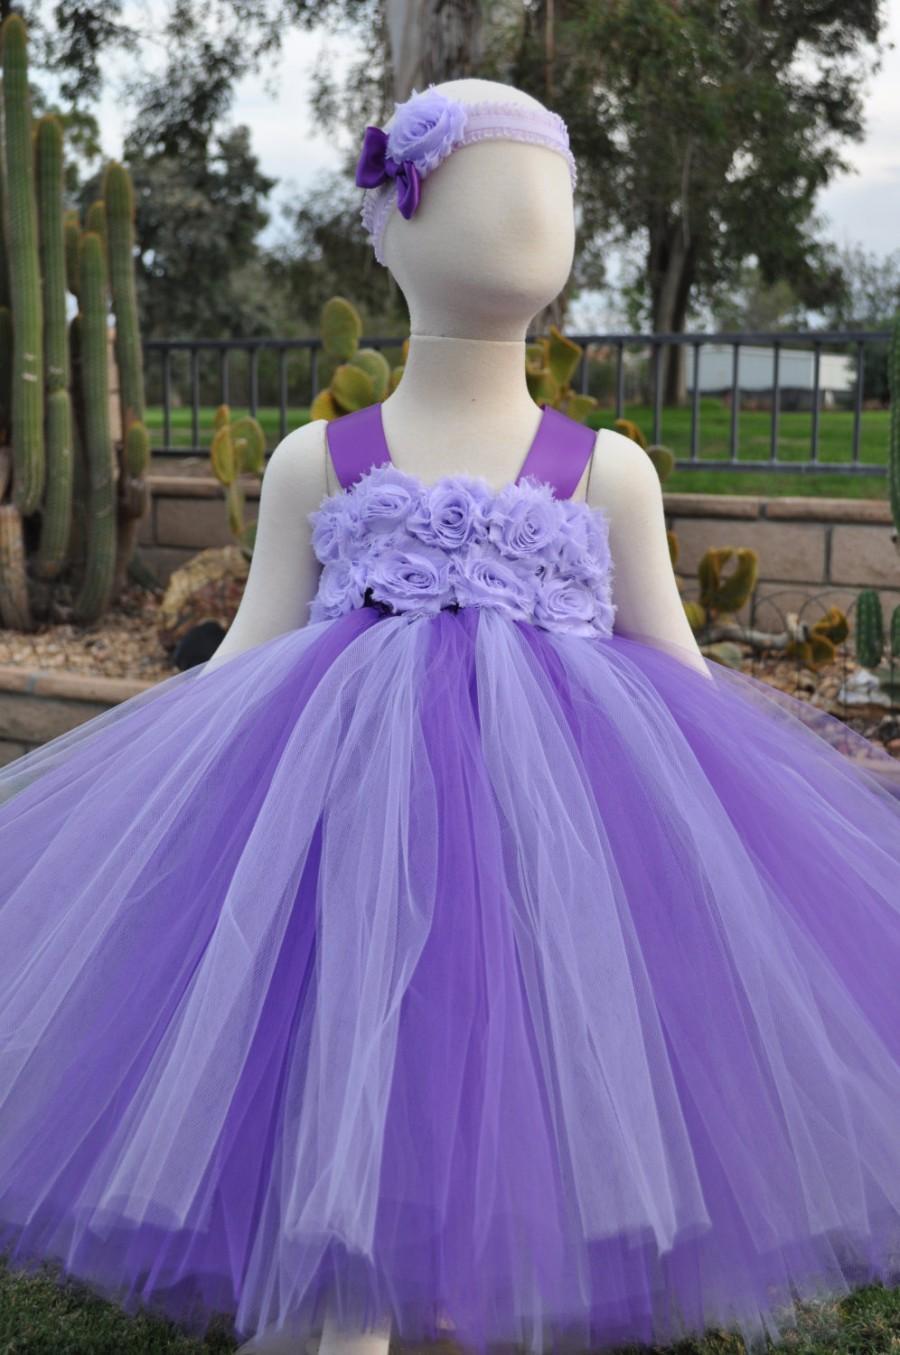 زفاف - Purple Lilac Flower Girl Dress, Lavender Flower Girl Dress, Purple Lilac Toddler Dress, Lilac Infant Dress, Lavender Baby Dress